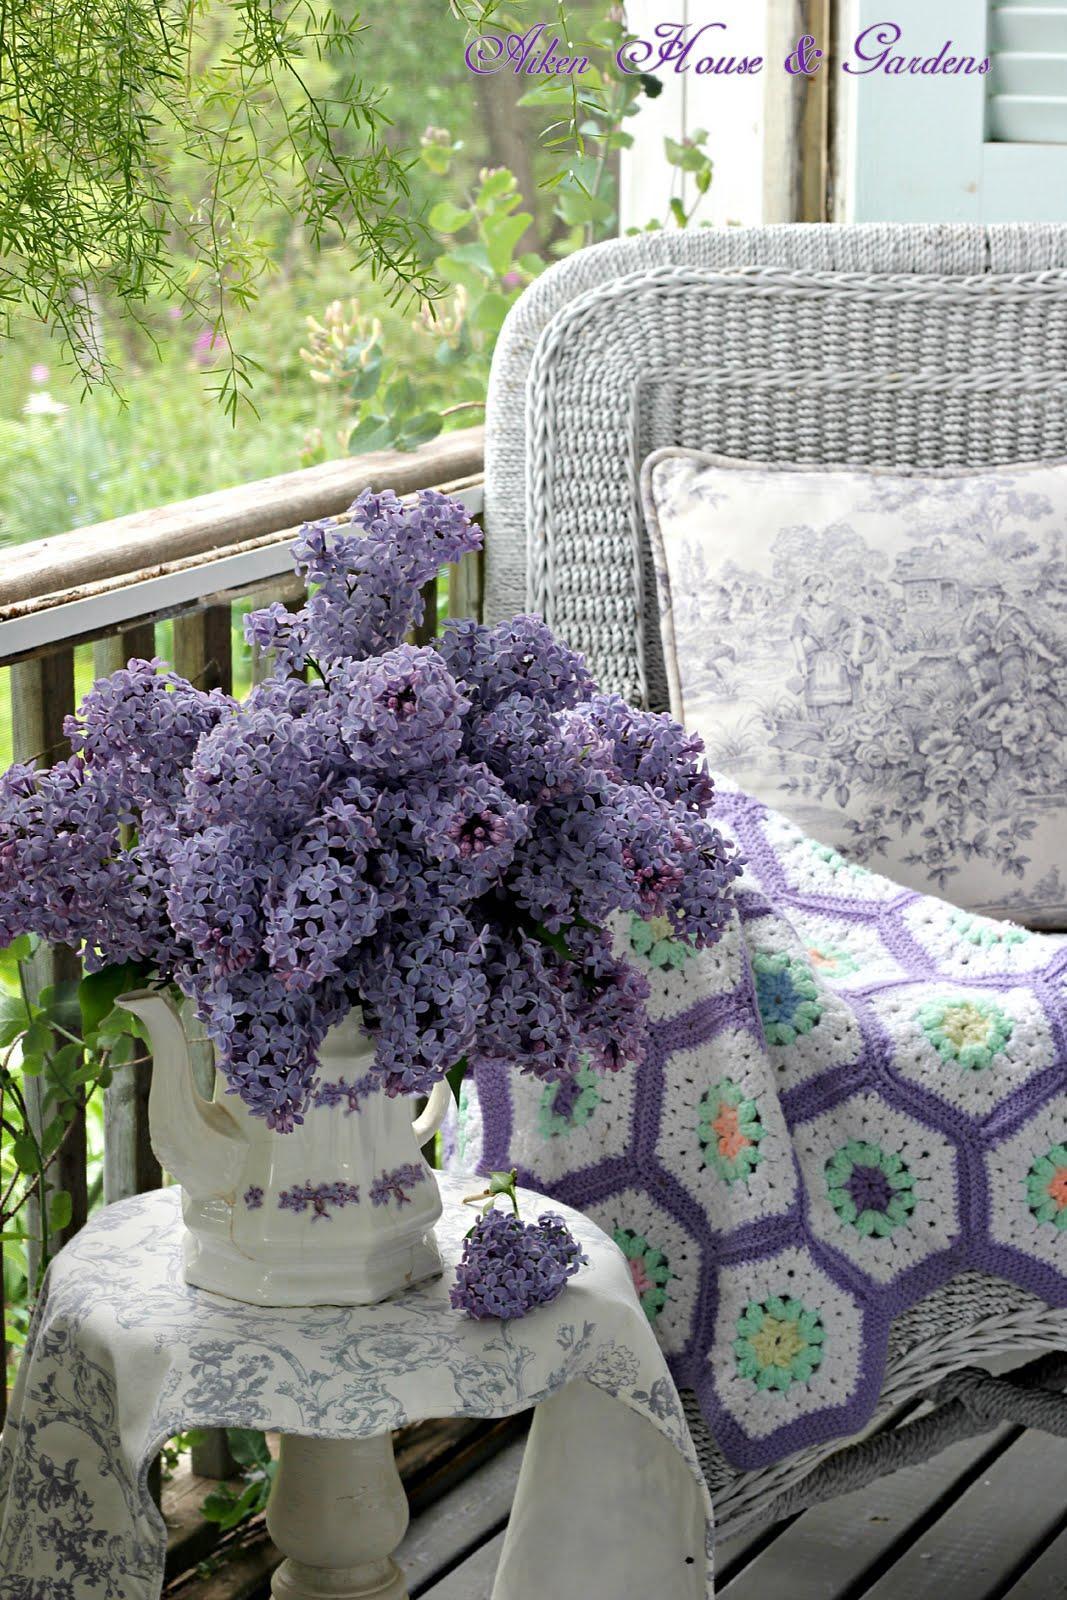 Aiken house gardens it 39 s lilac season in our garden for Aiken house